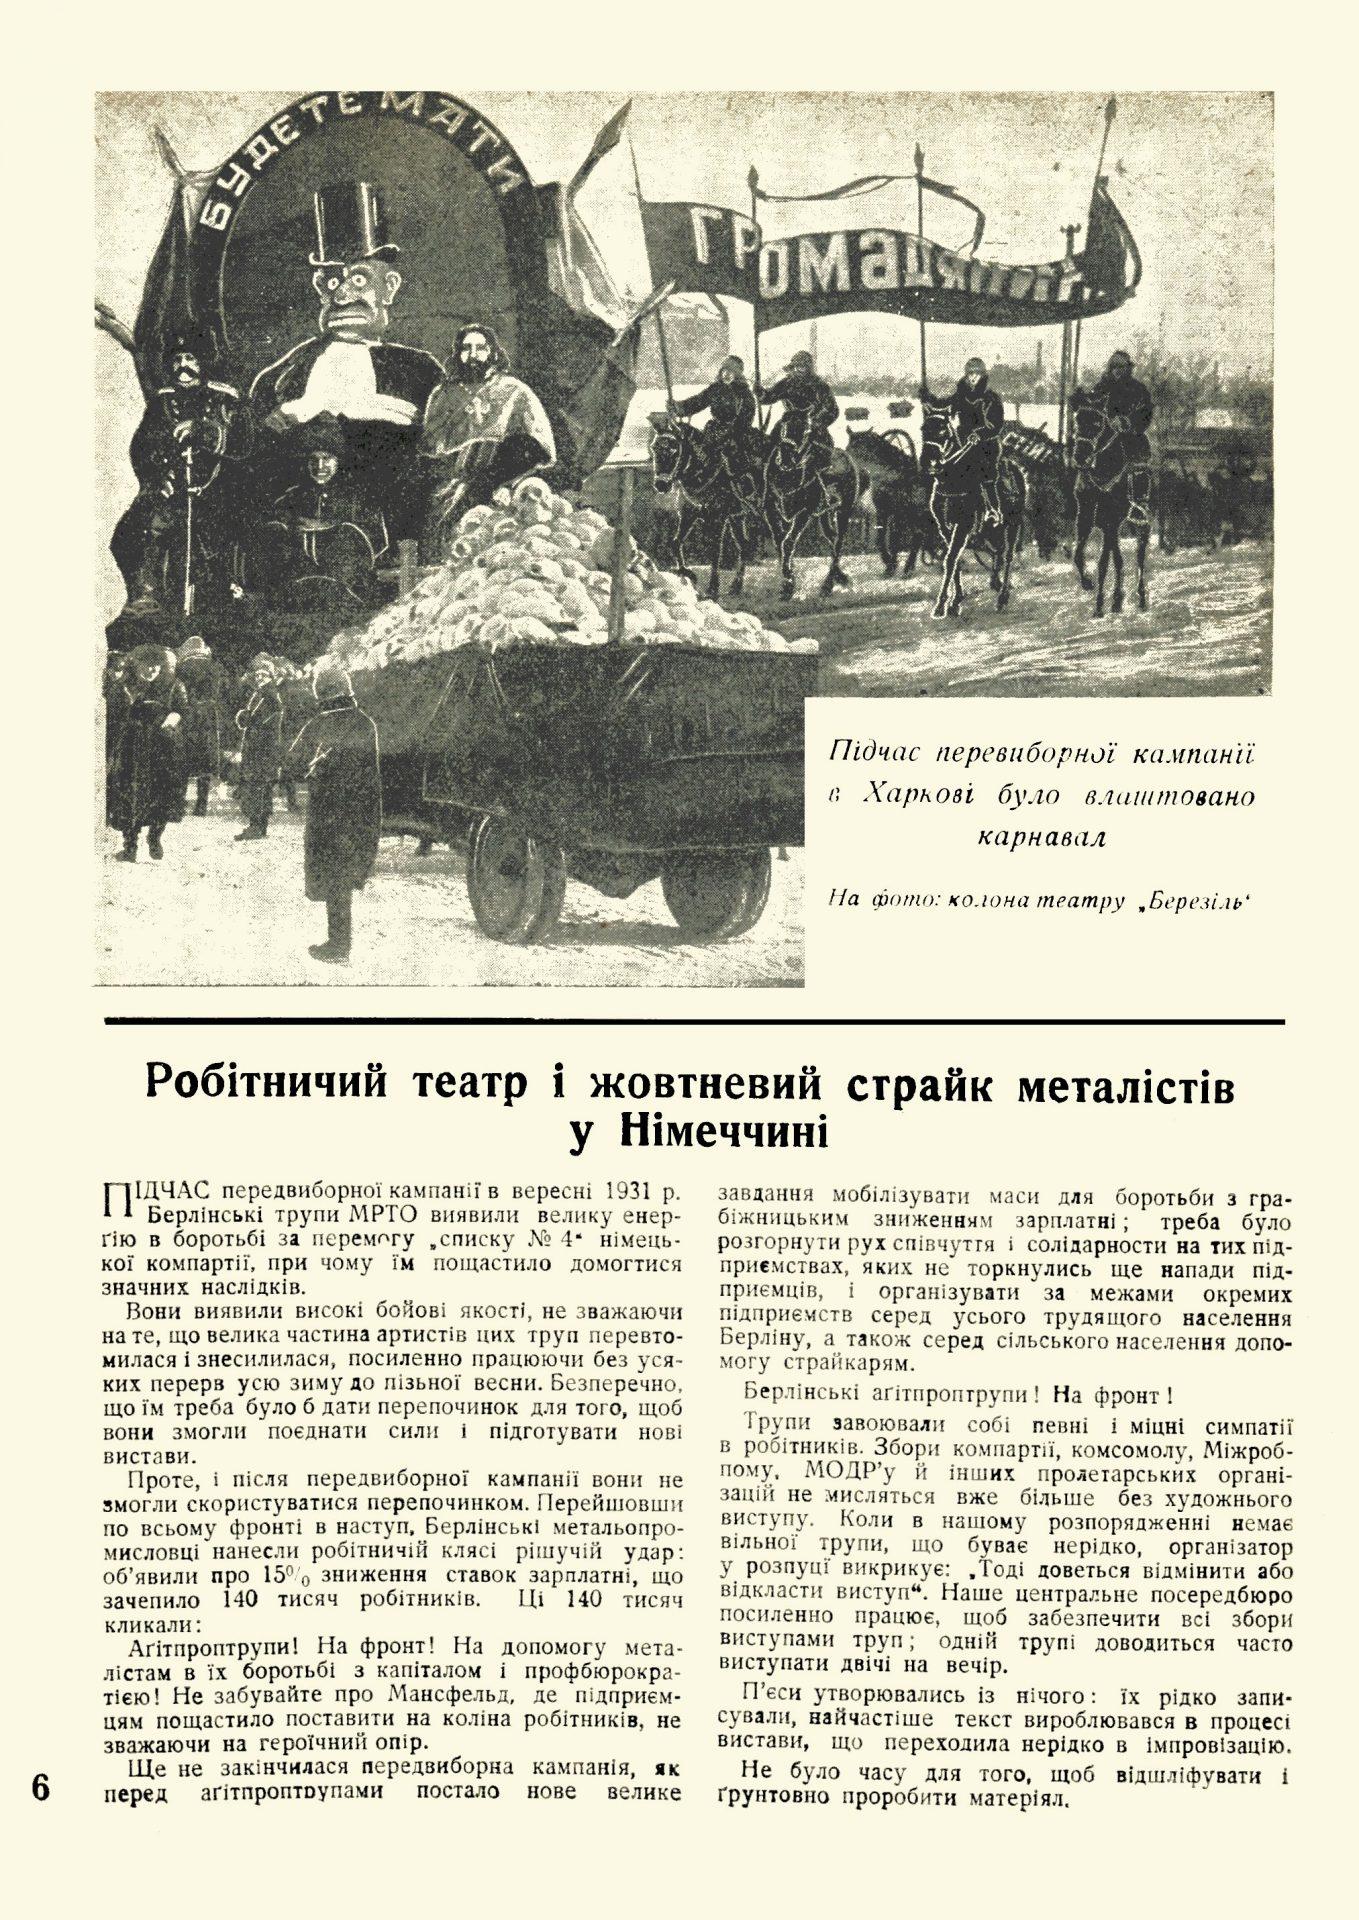 Мистецька трибуна_1931_№ 3